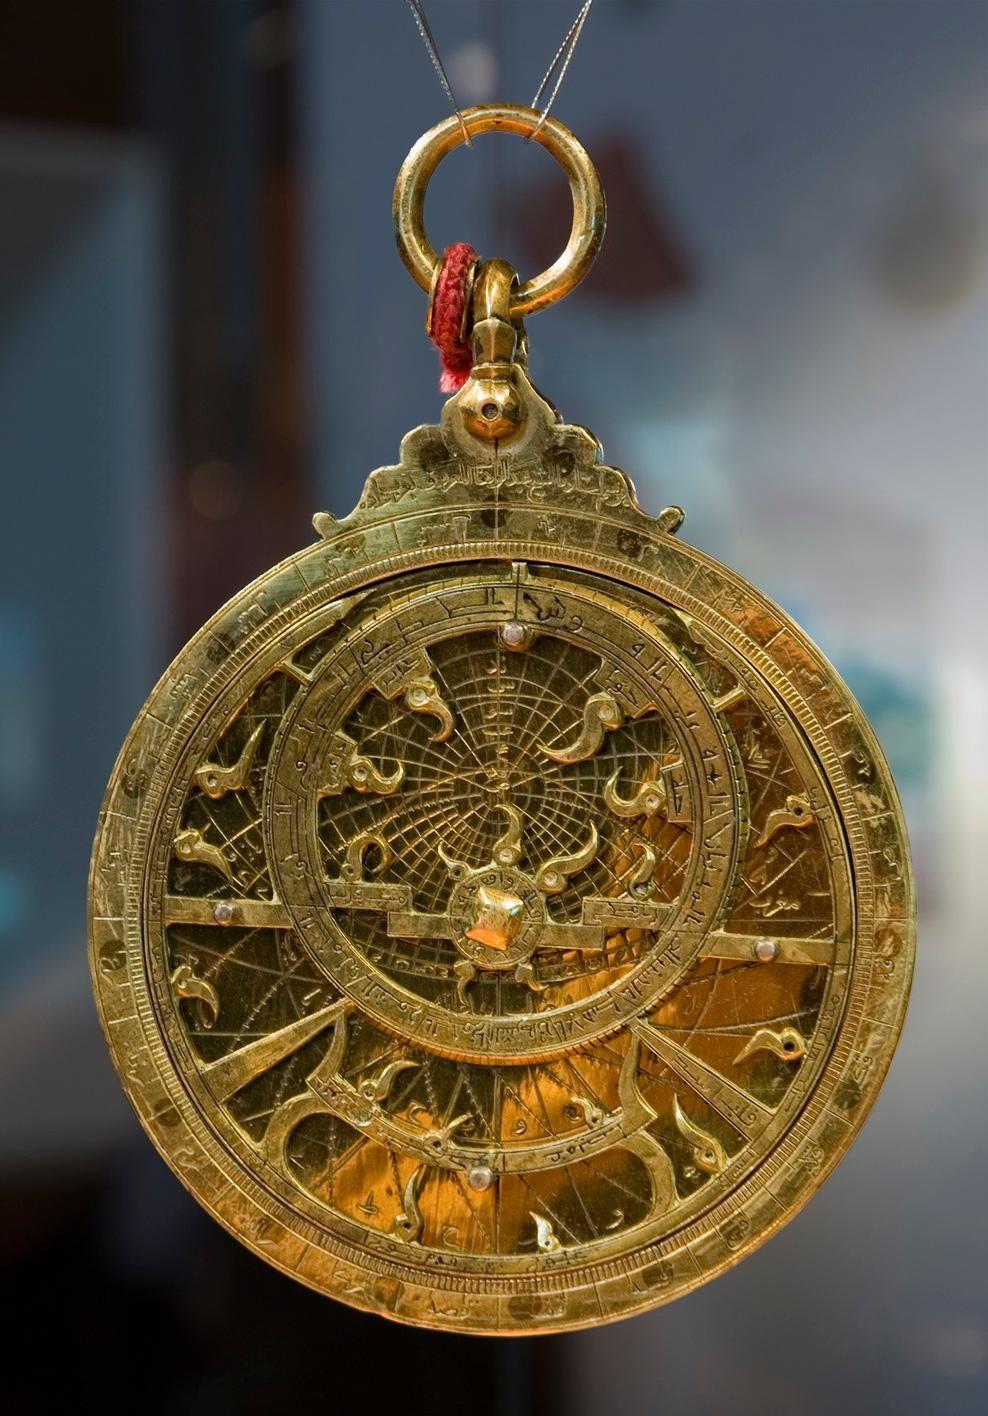 Benjamin Franklin Mocked Eclipse Astrology to Elevate Science